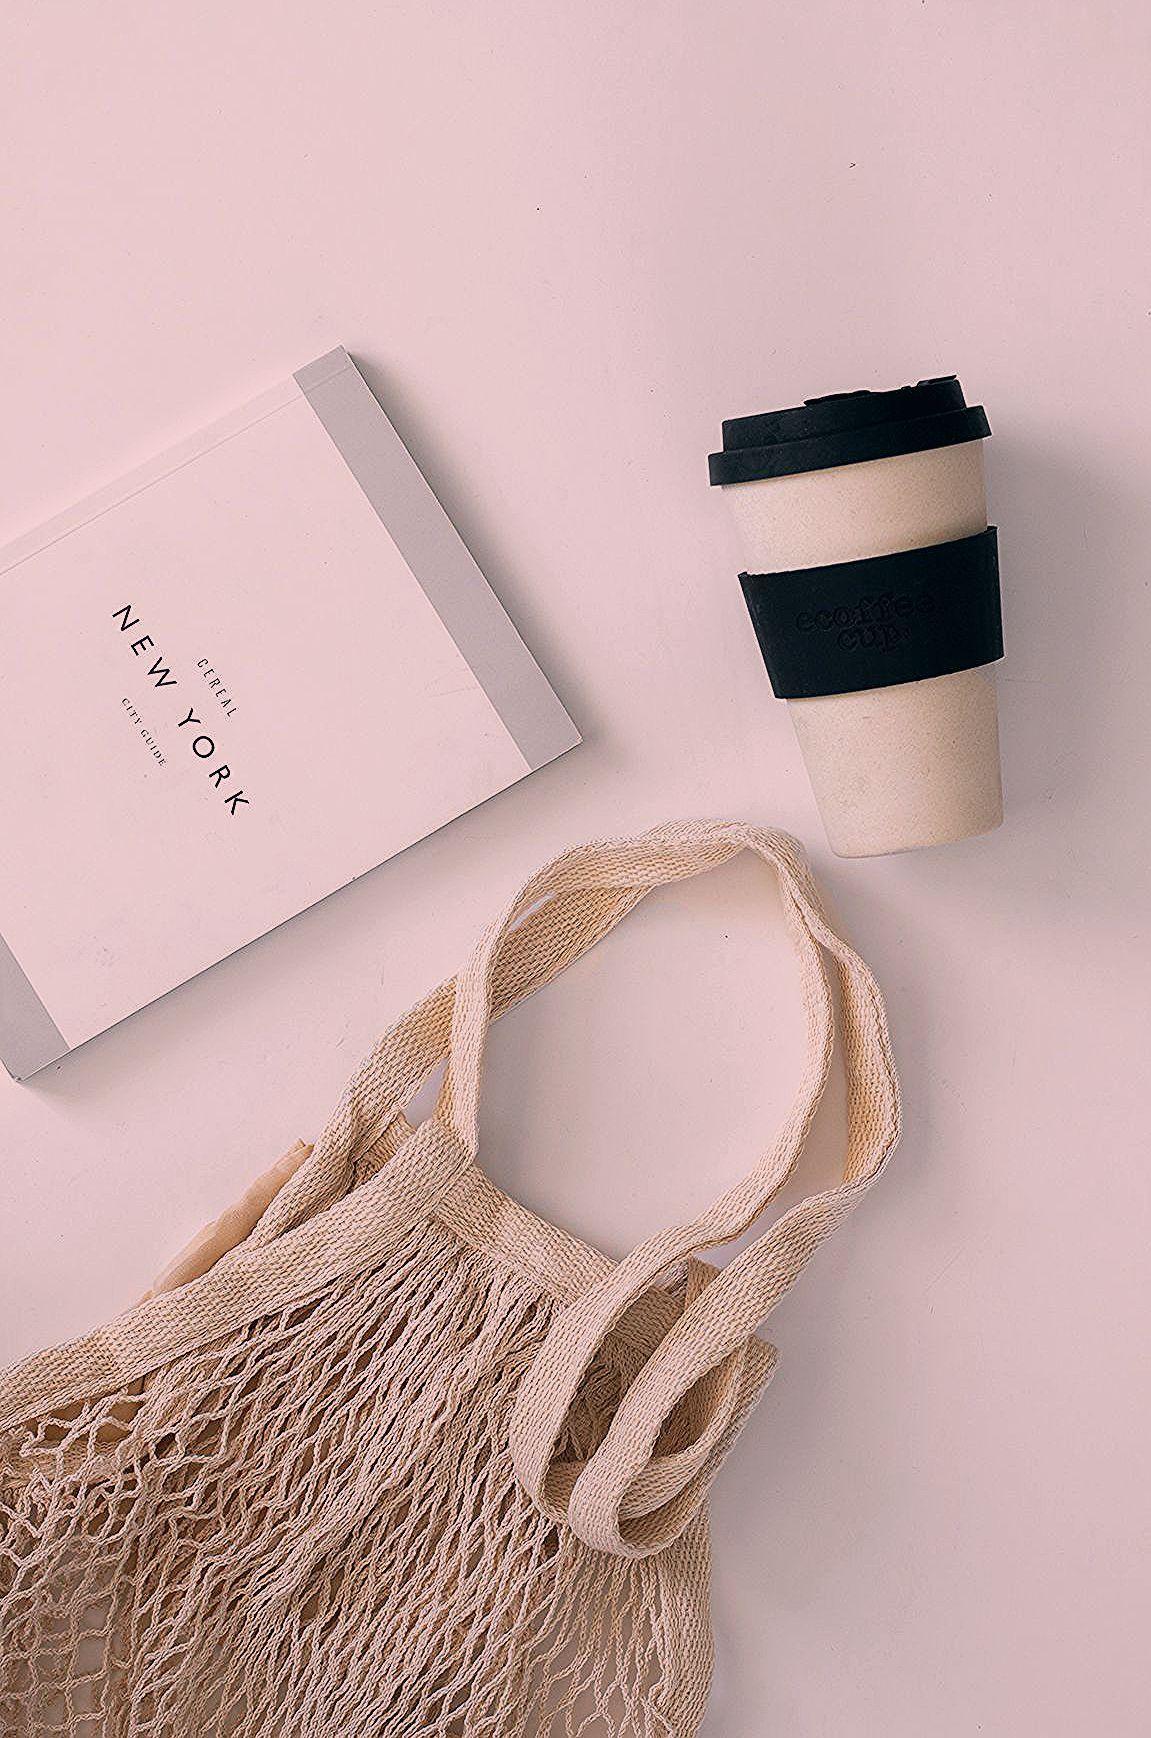 Photo of Zero waste(ish) travel essentials – The Lifestyle Files